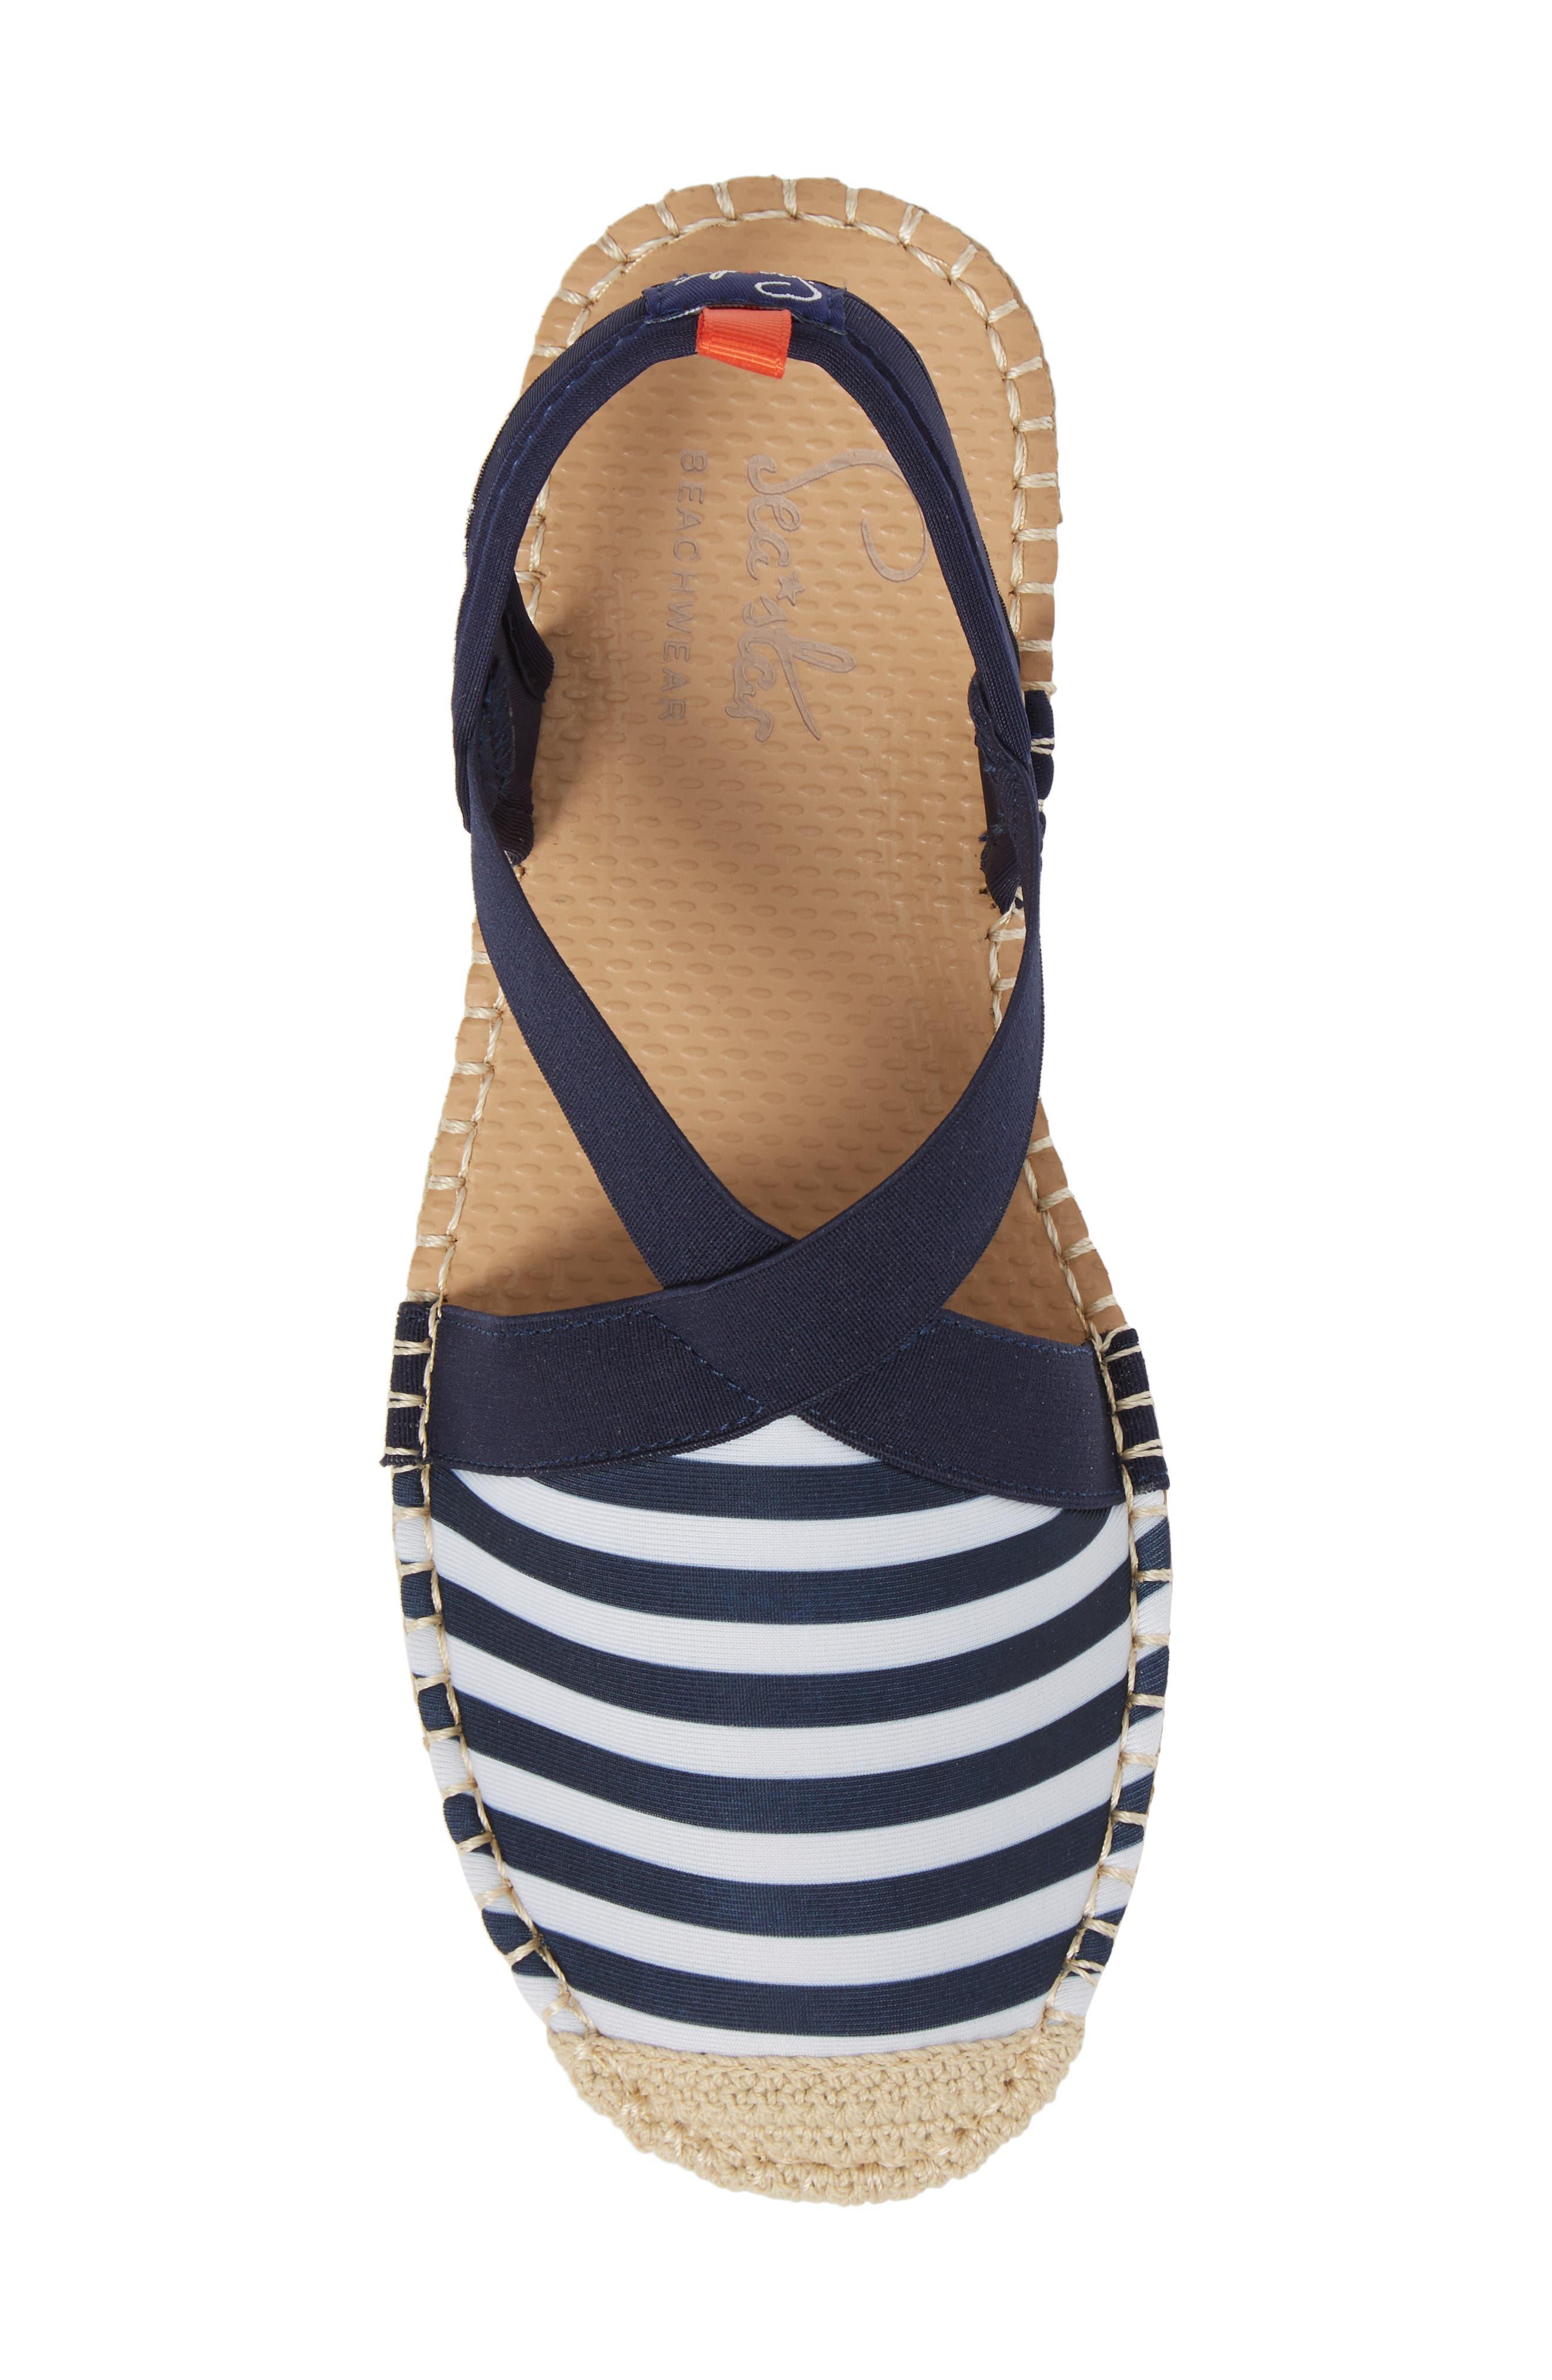 Sea Star Slingback Espadrille Water Shoe,                             Alternate thumbnail 5, color,                             Navy/ White Stripes